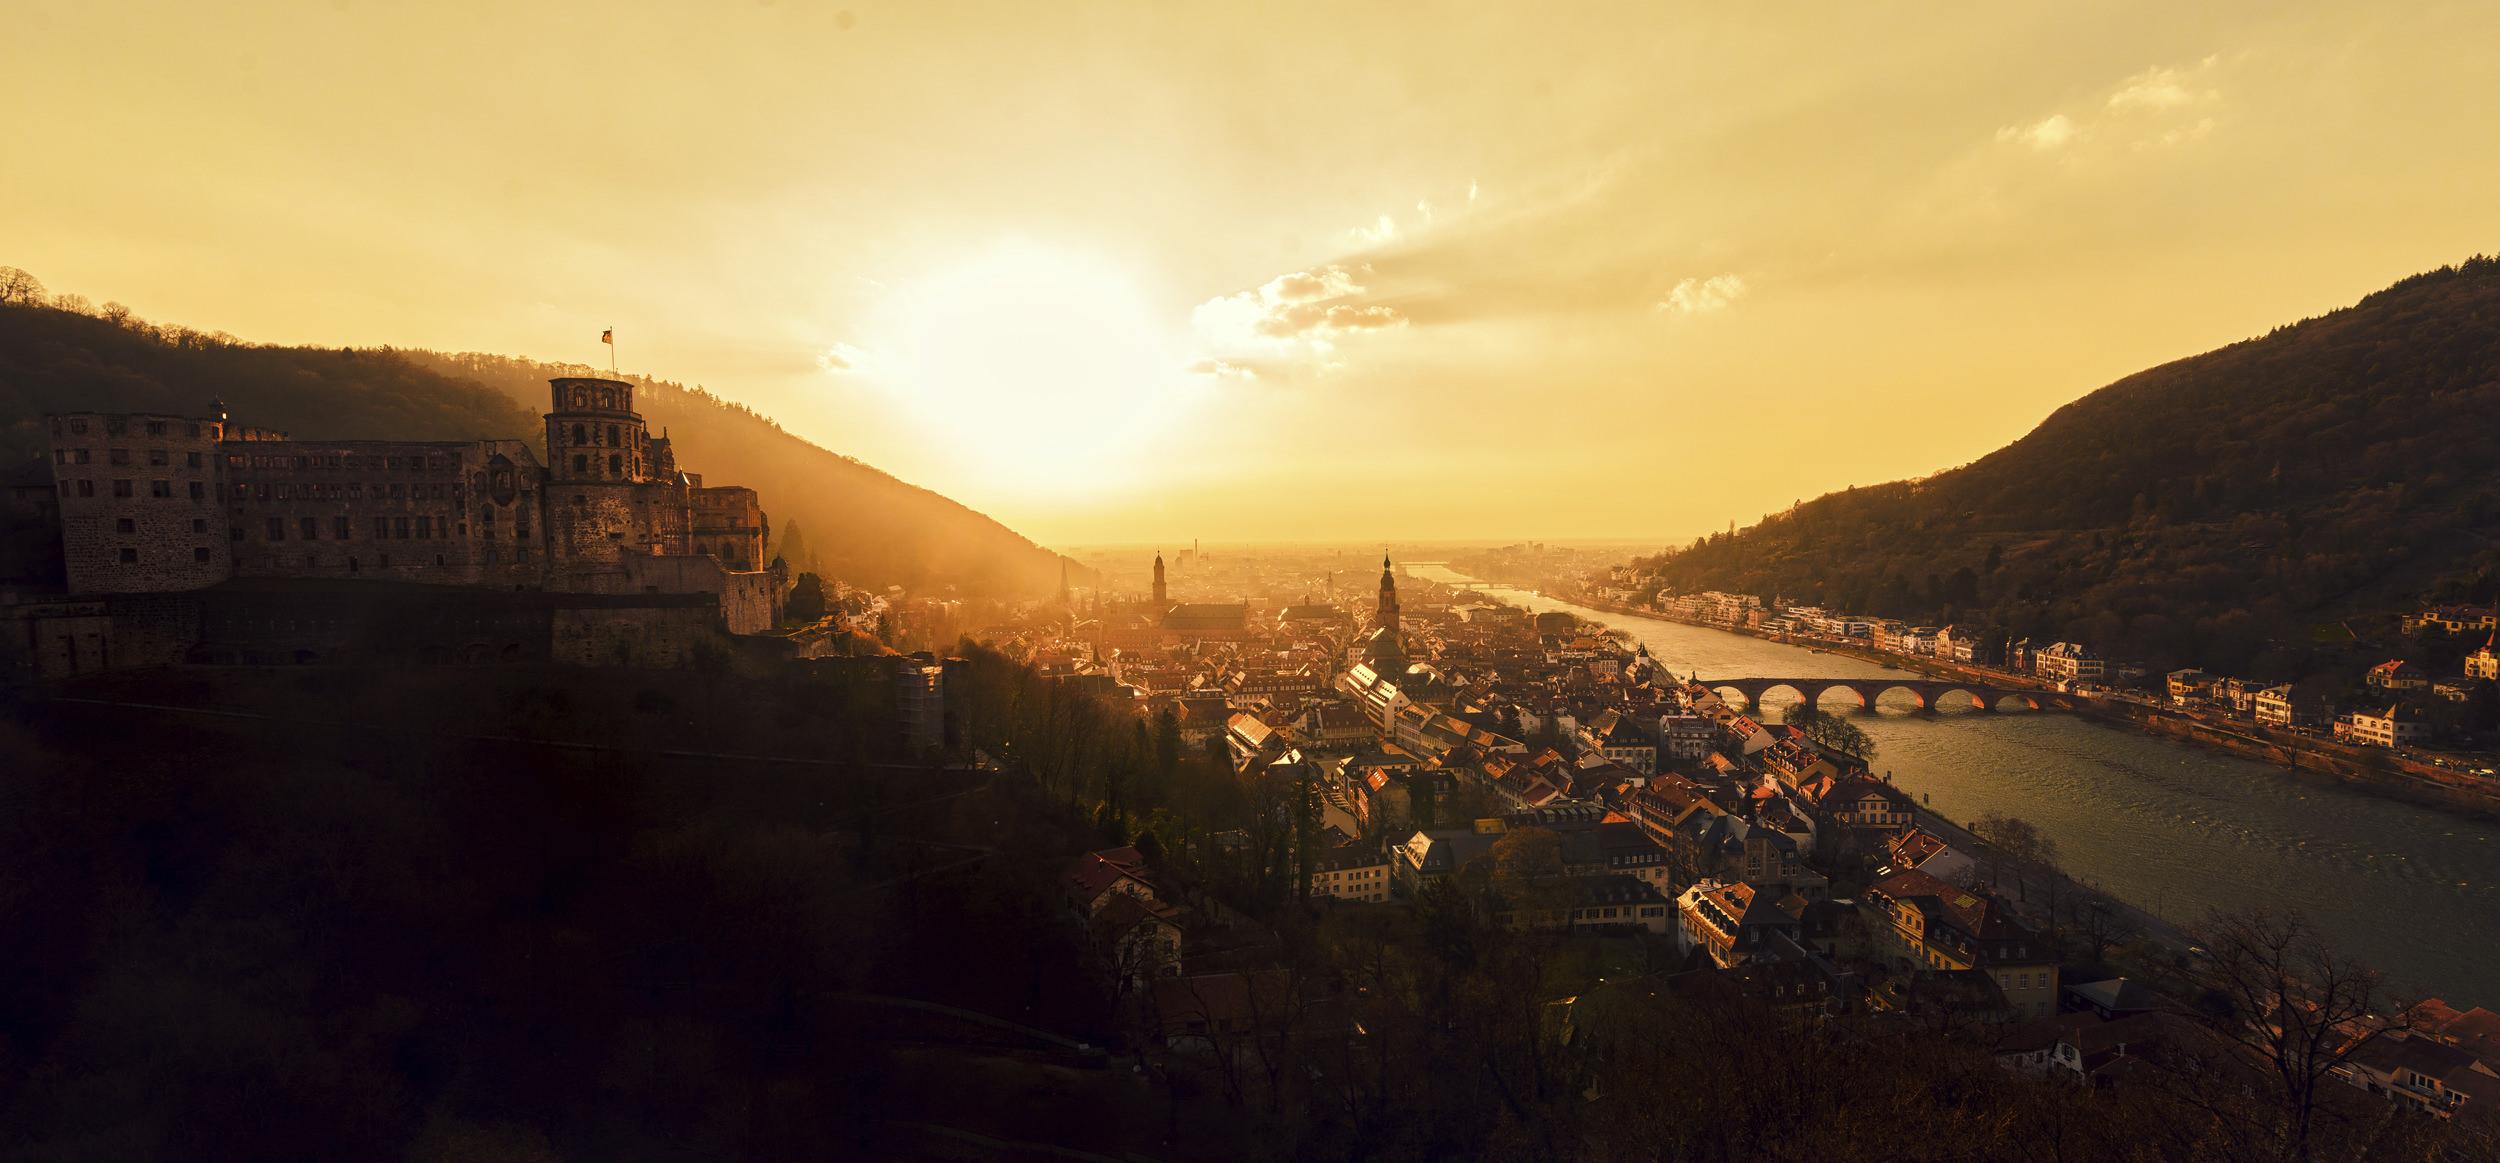 Landschaftsfotografie fotograf filmemacher frankfurt patrick schmetzer drohne landschaft natur 69